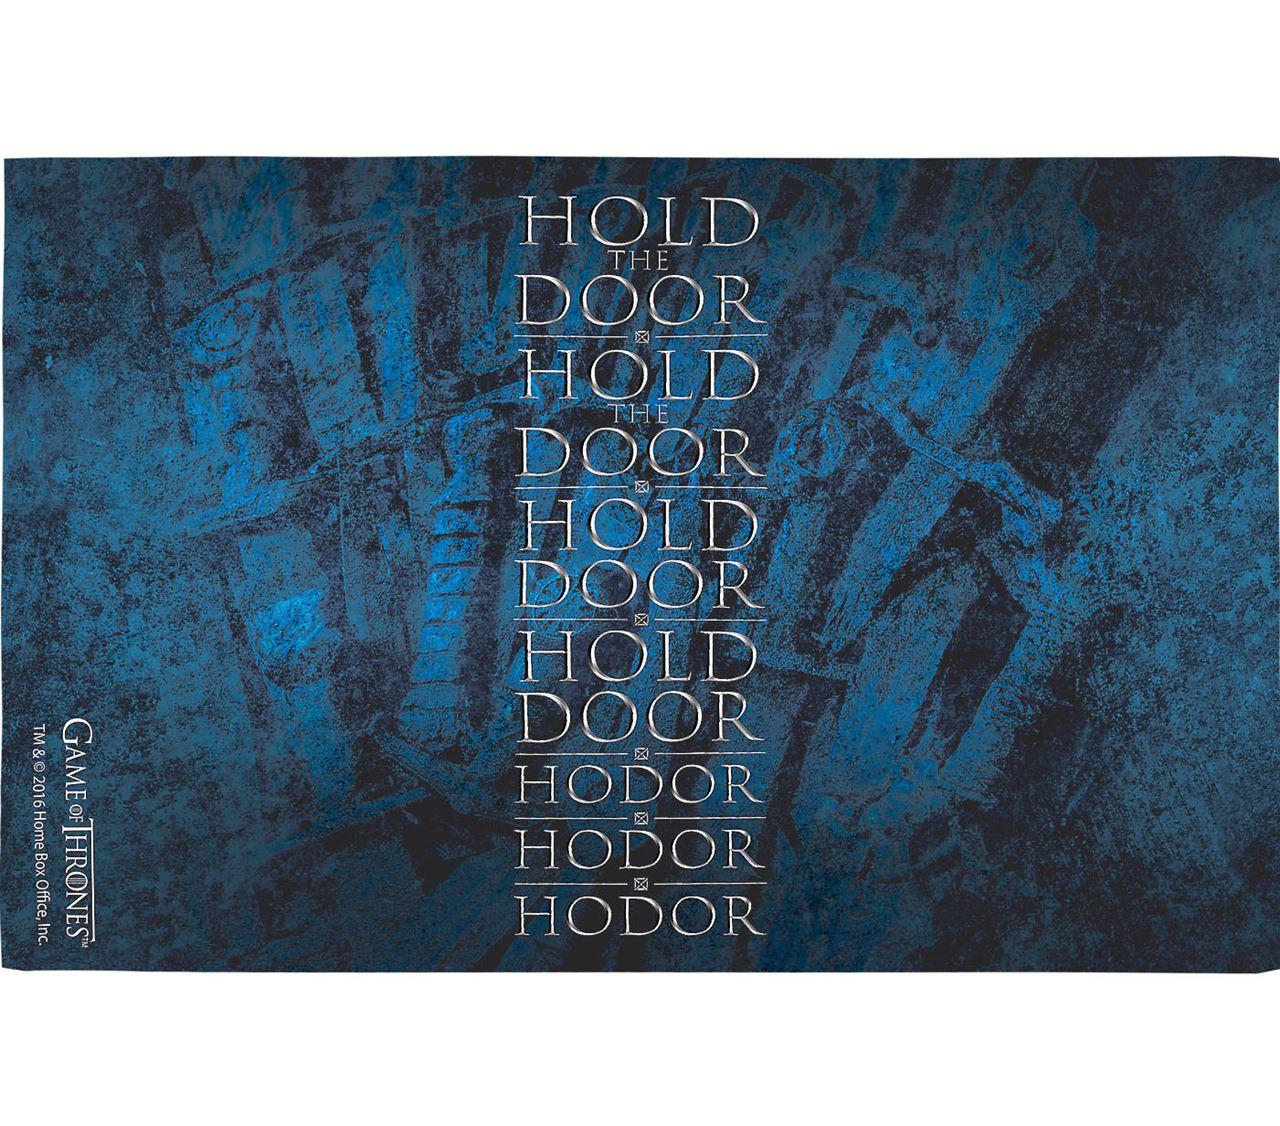 Game of Thrones™ - Hold the Door Hodor 16oz Tumbler by Tervis